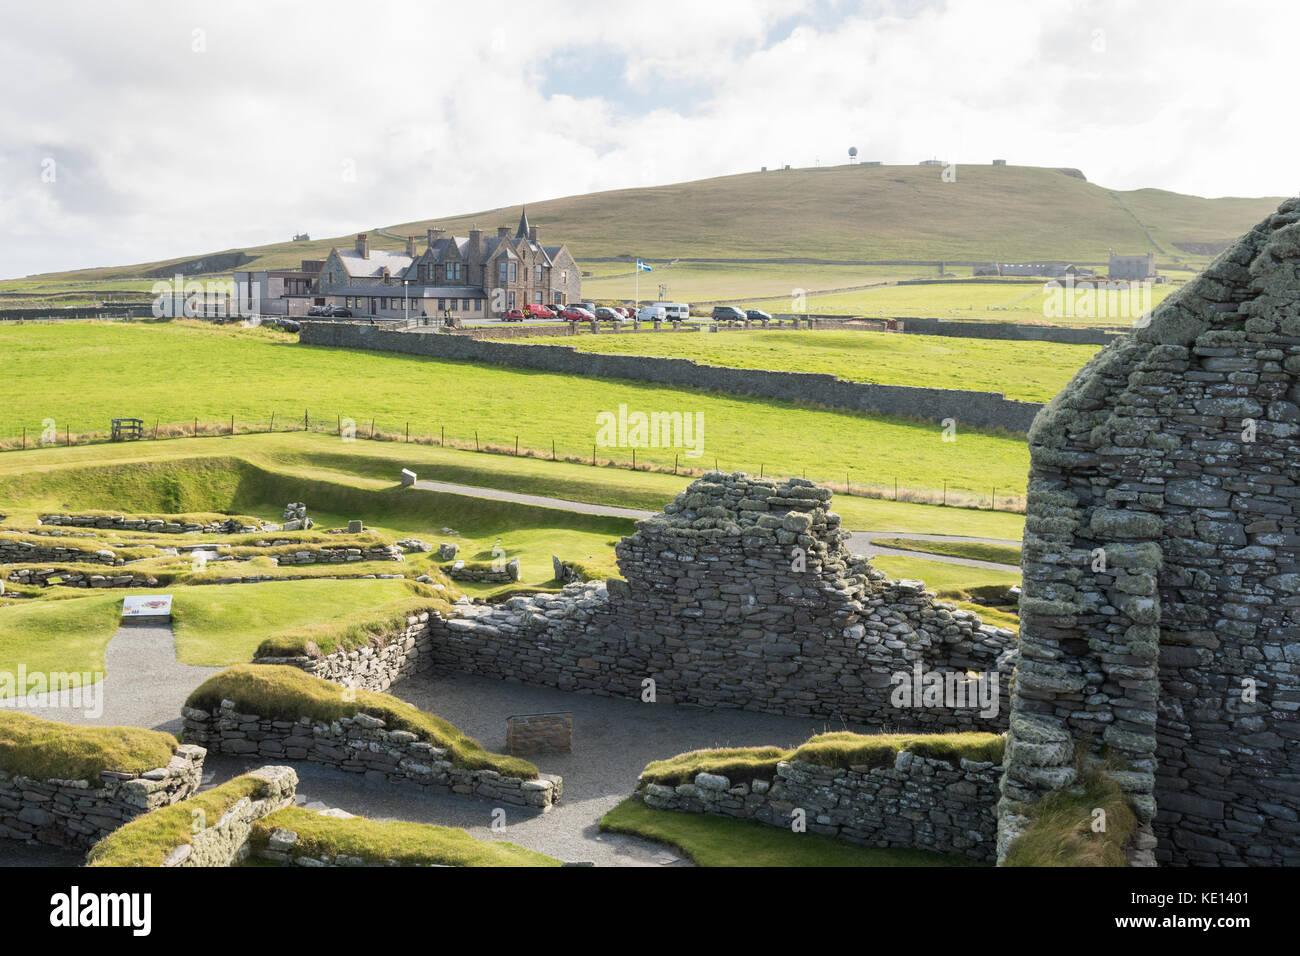 Sumburgh Hotel as seen from Jarlshof archaeological site, Sumburgh, Virkie, Shetland, Scotland, UK - Stock Image